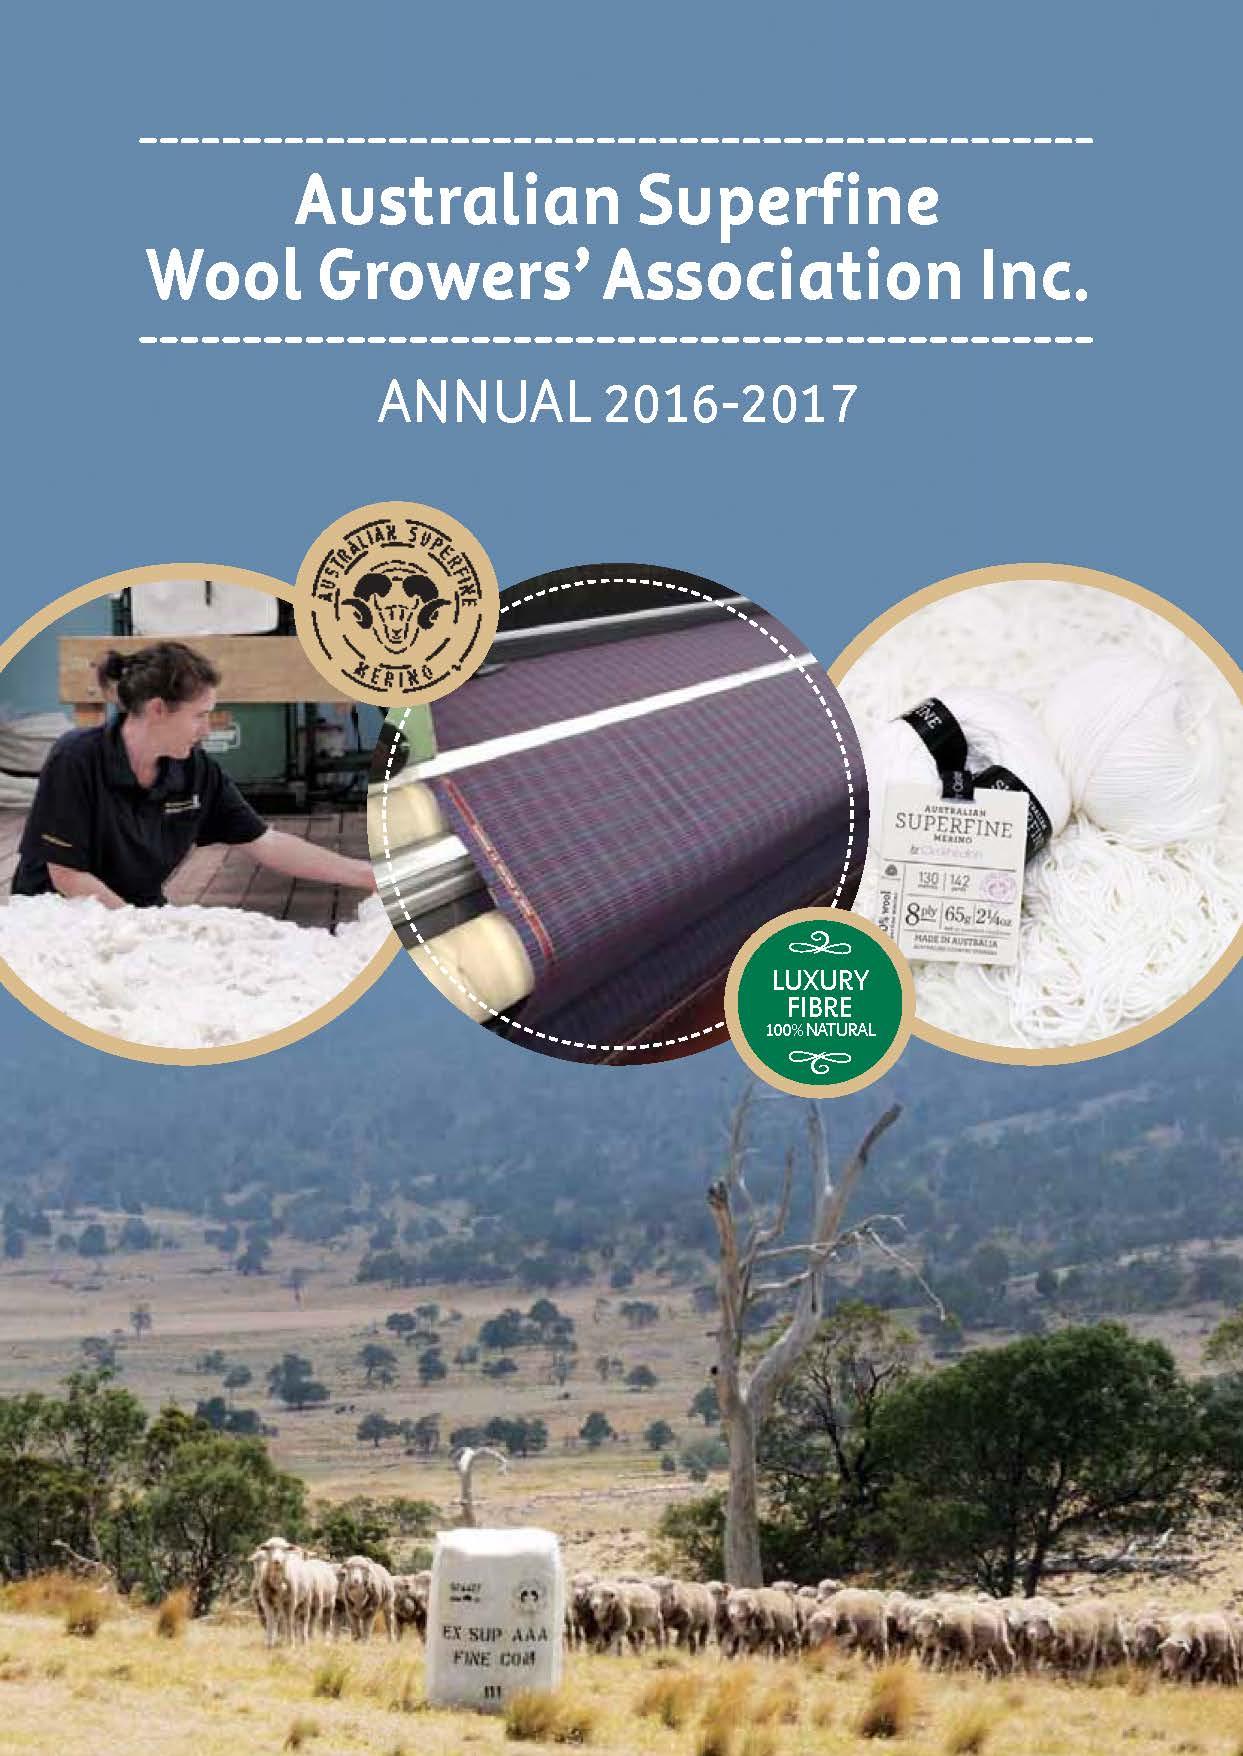 Cover ASWGA 2016-2017 Annual.jpg